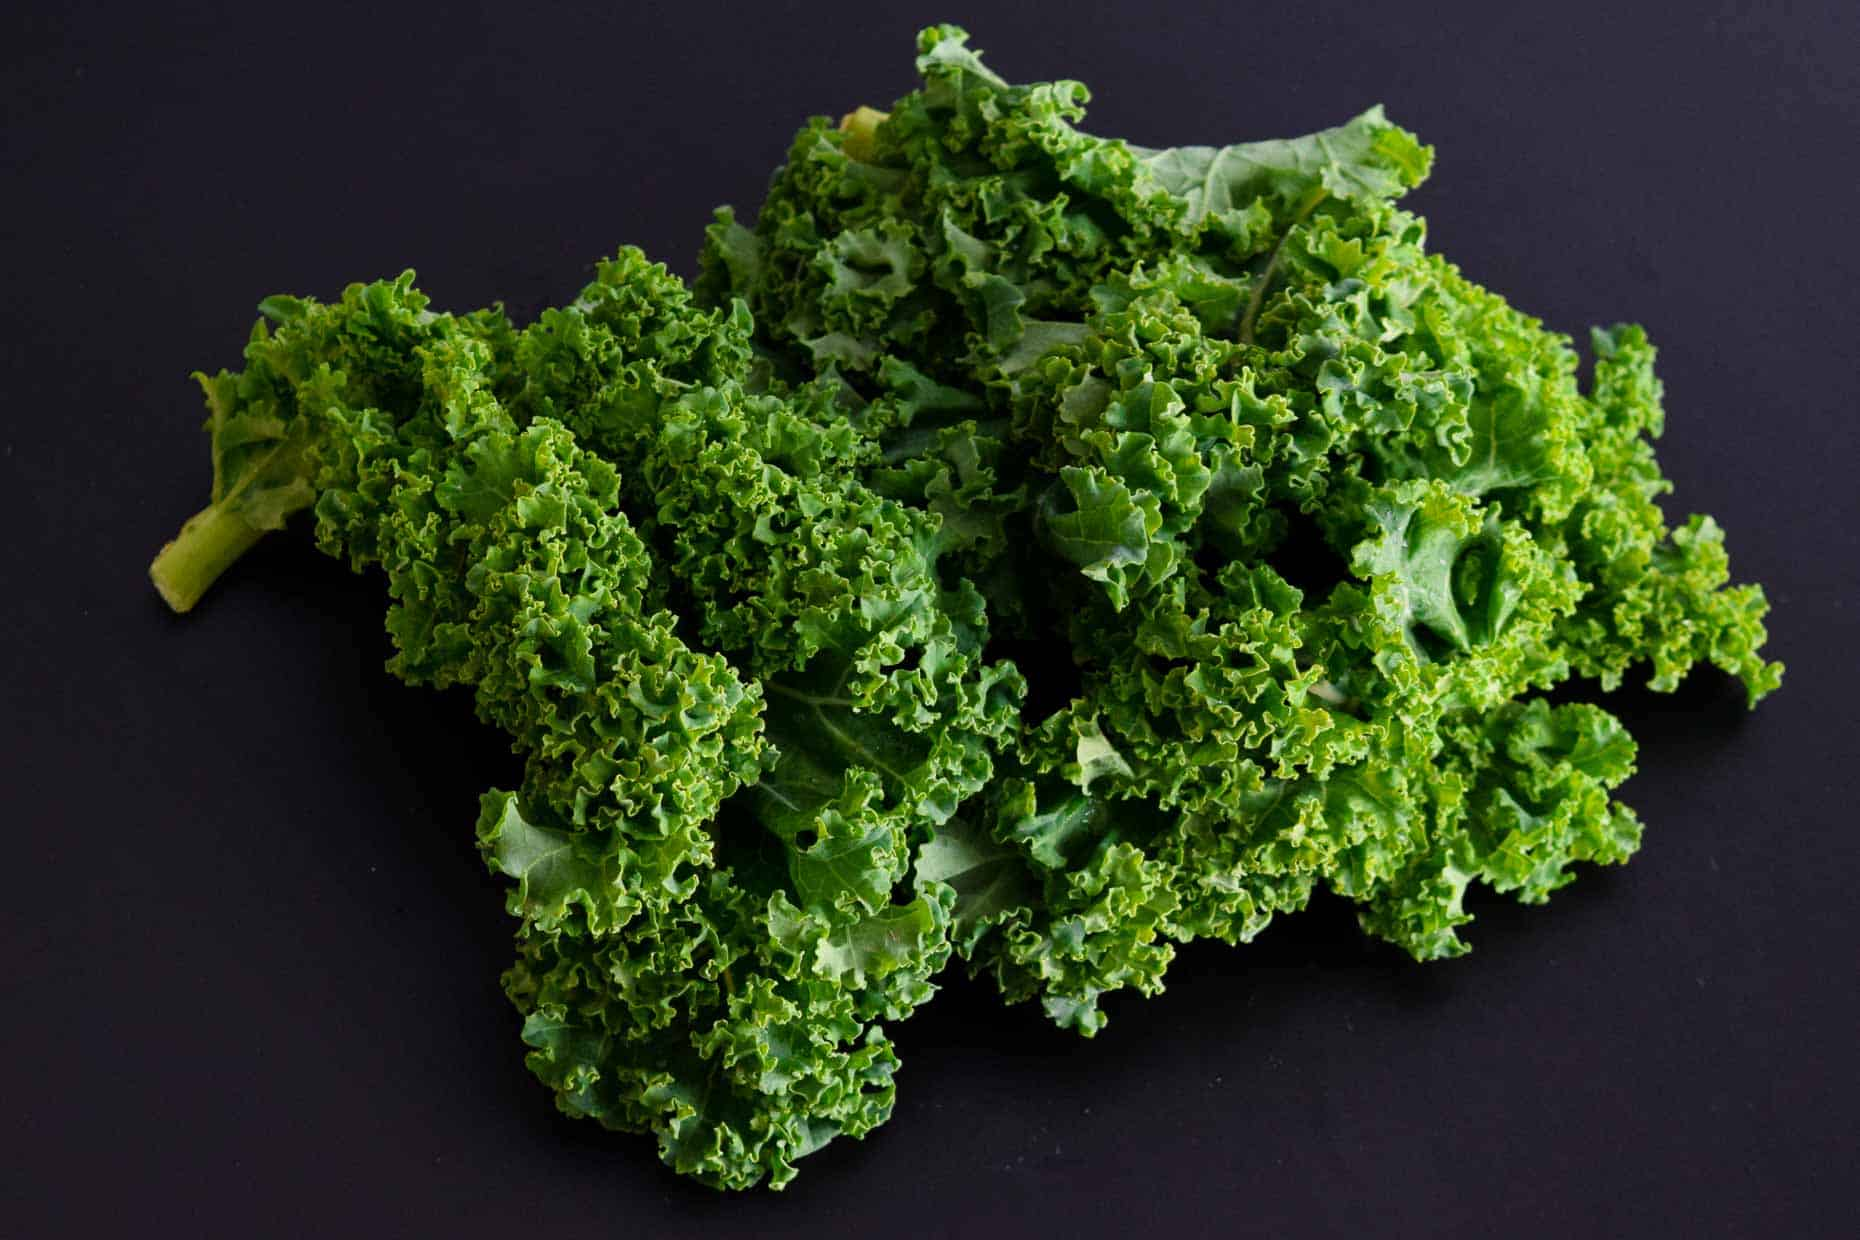 Kale on black background